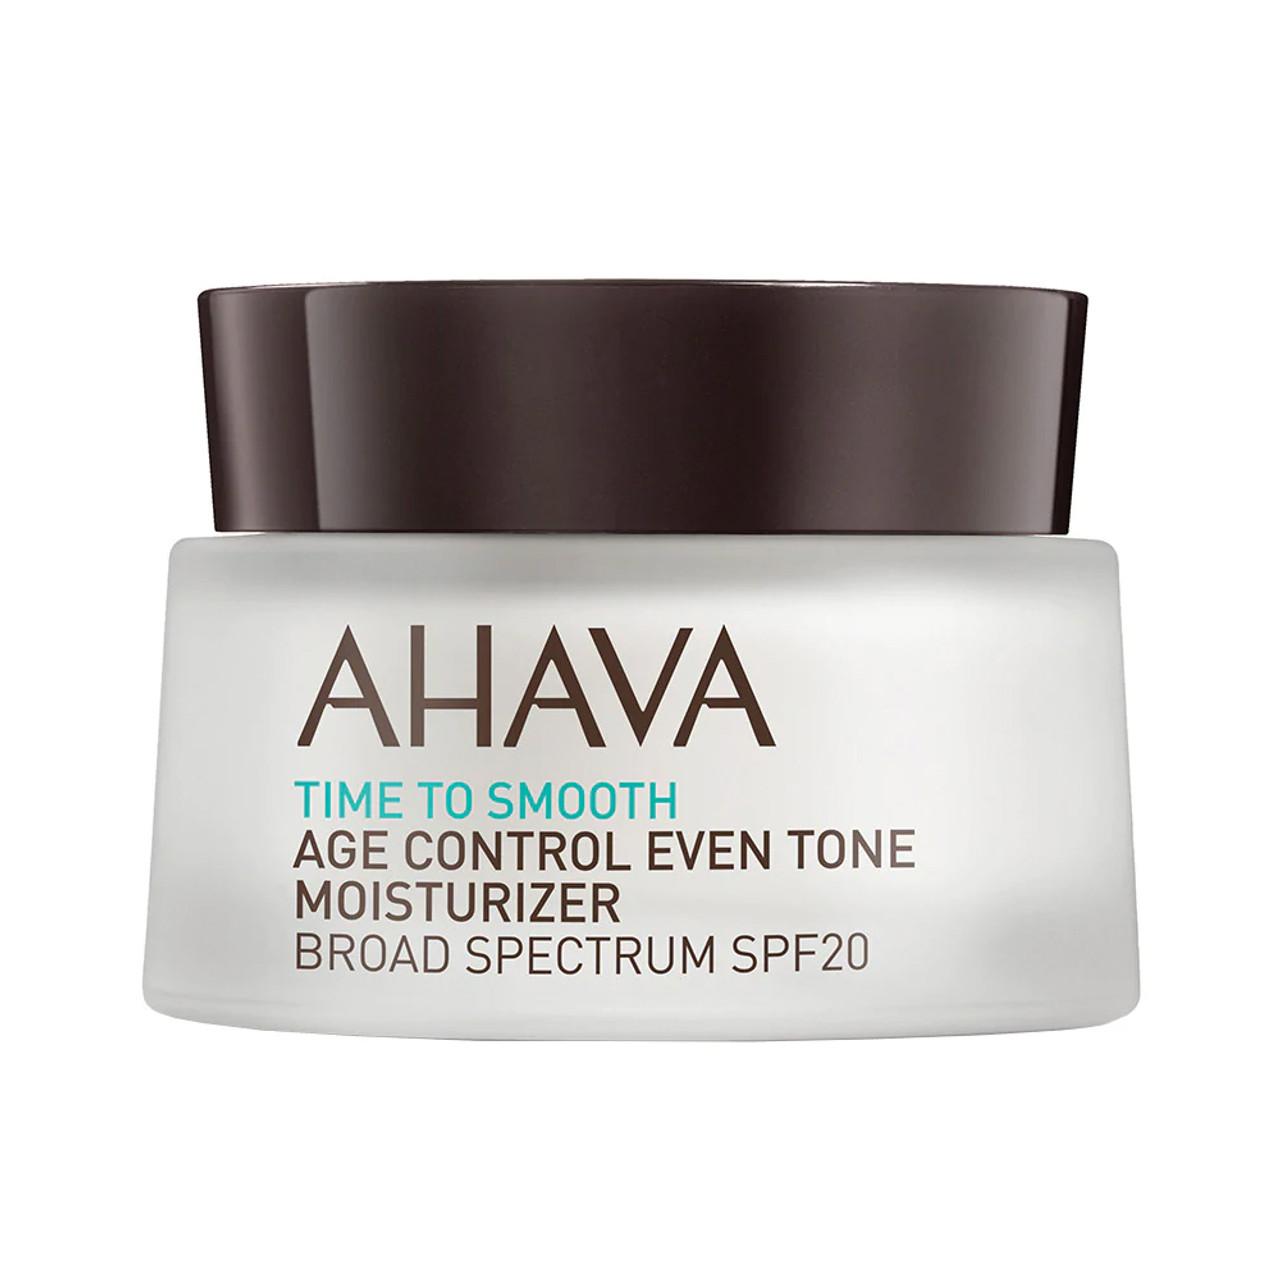 AHAVA Age Control Even Tone Moisturizer Broad Spectrum SPF 20 BeautifiedYou.com